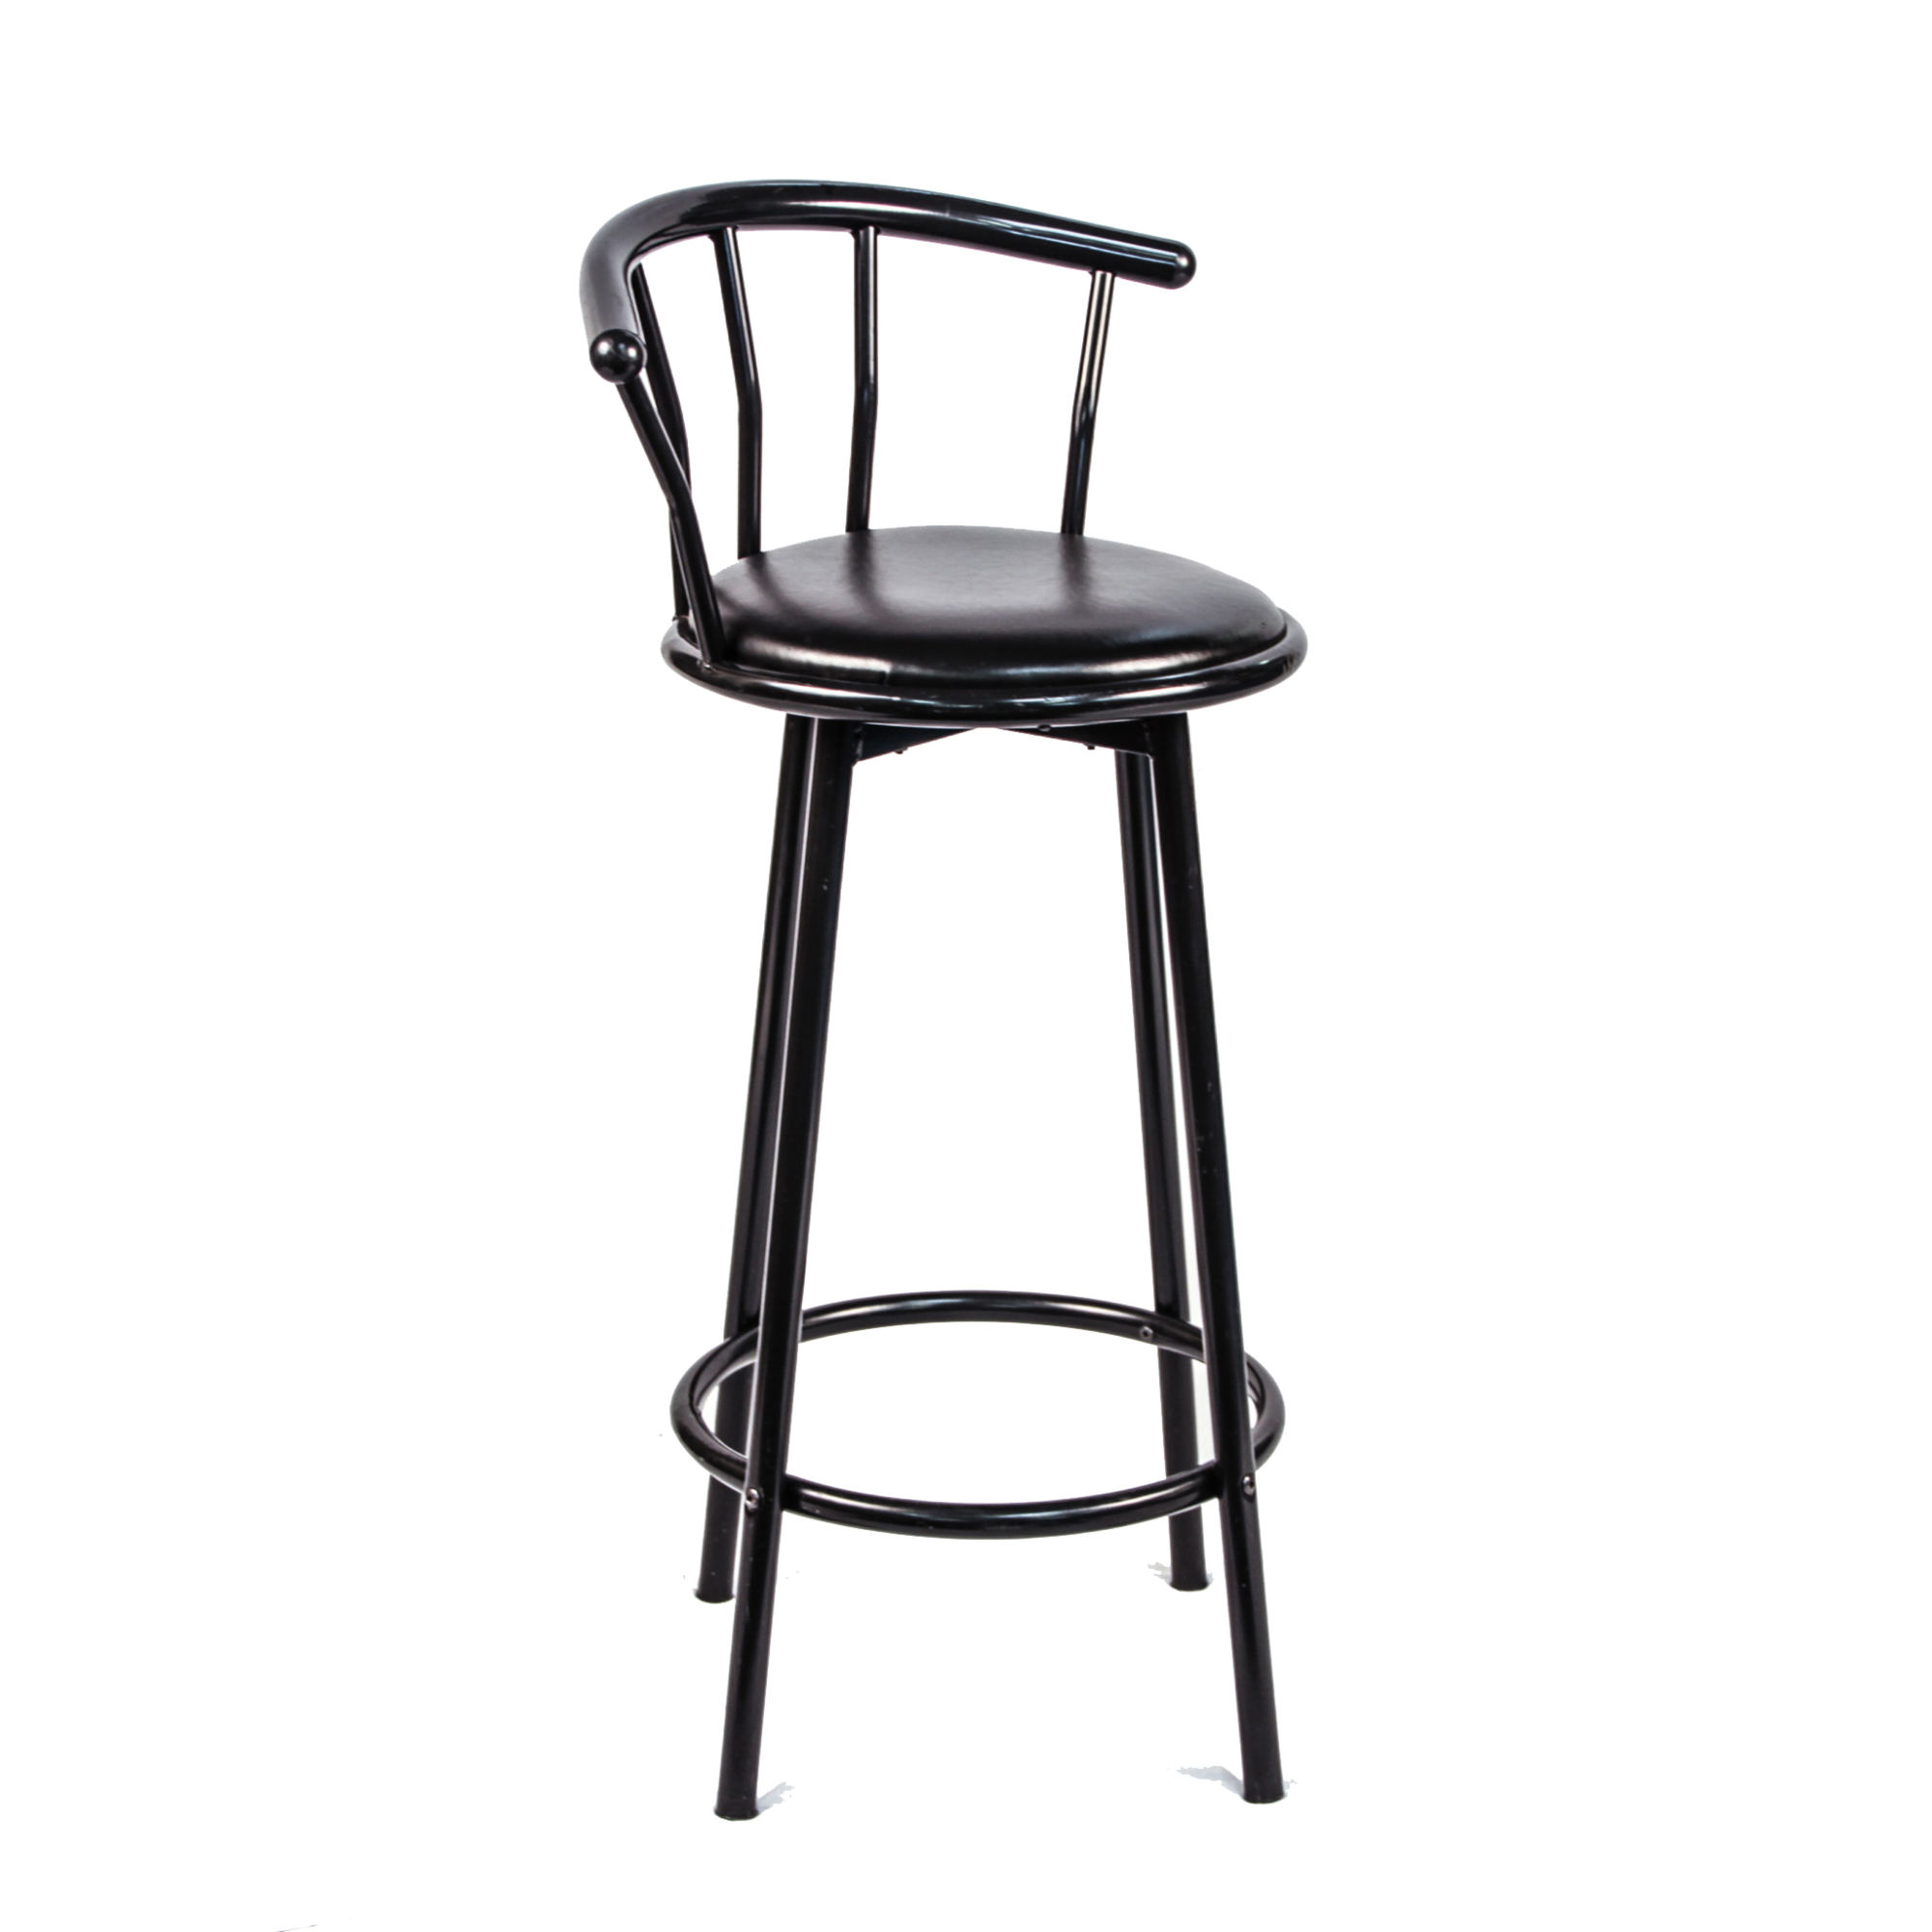 Admirable Spindle Back Bar Stool Black 29 Peter Corvallis Evergreenethics Interior Chair Design Evergreenethicsorg